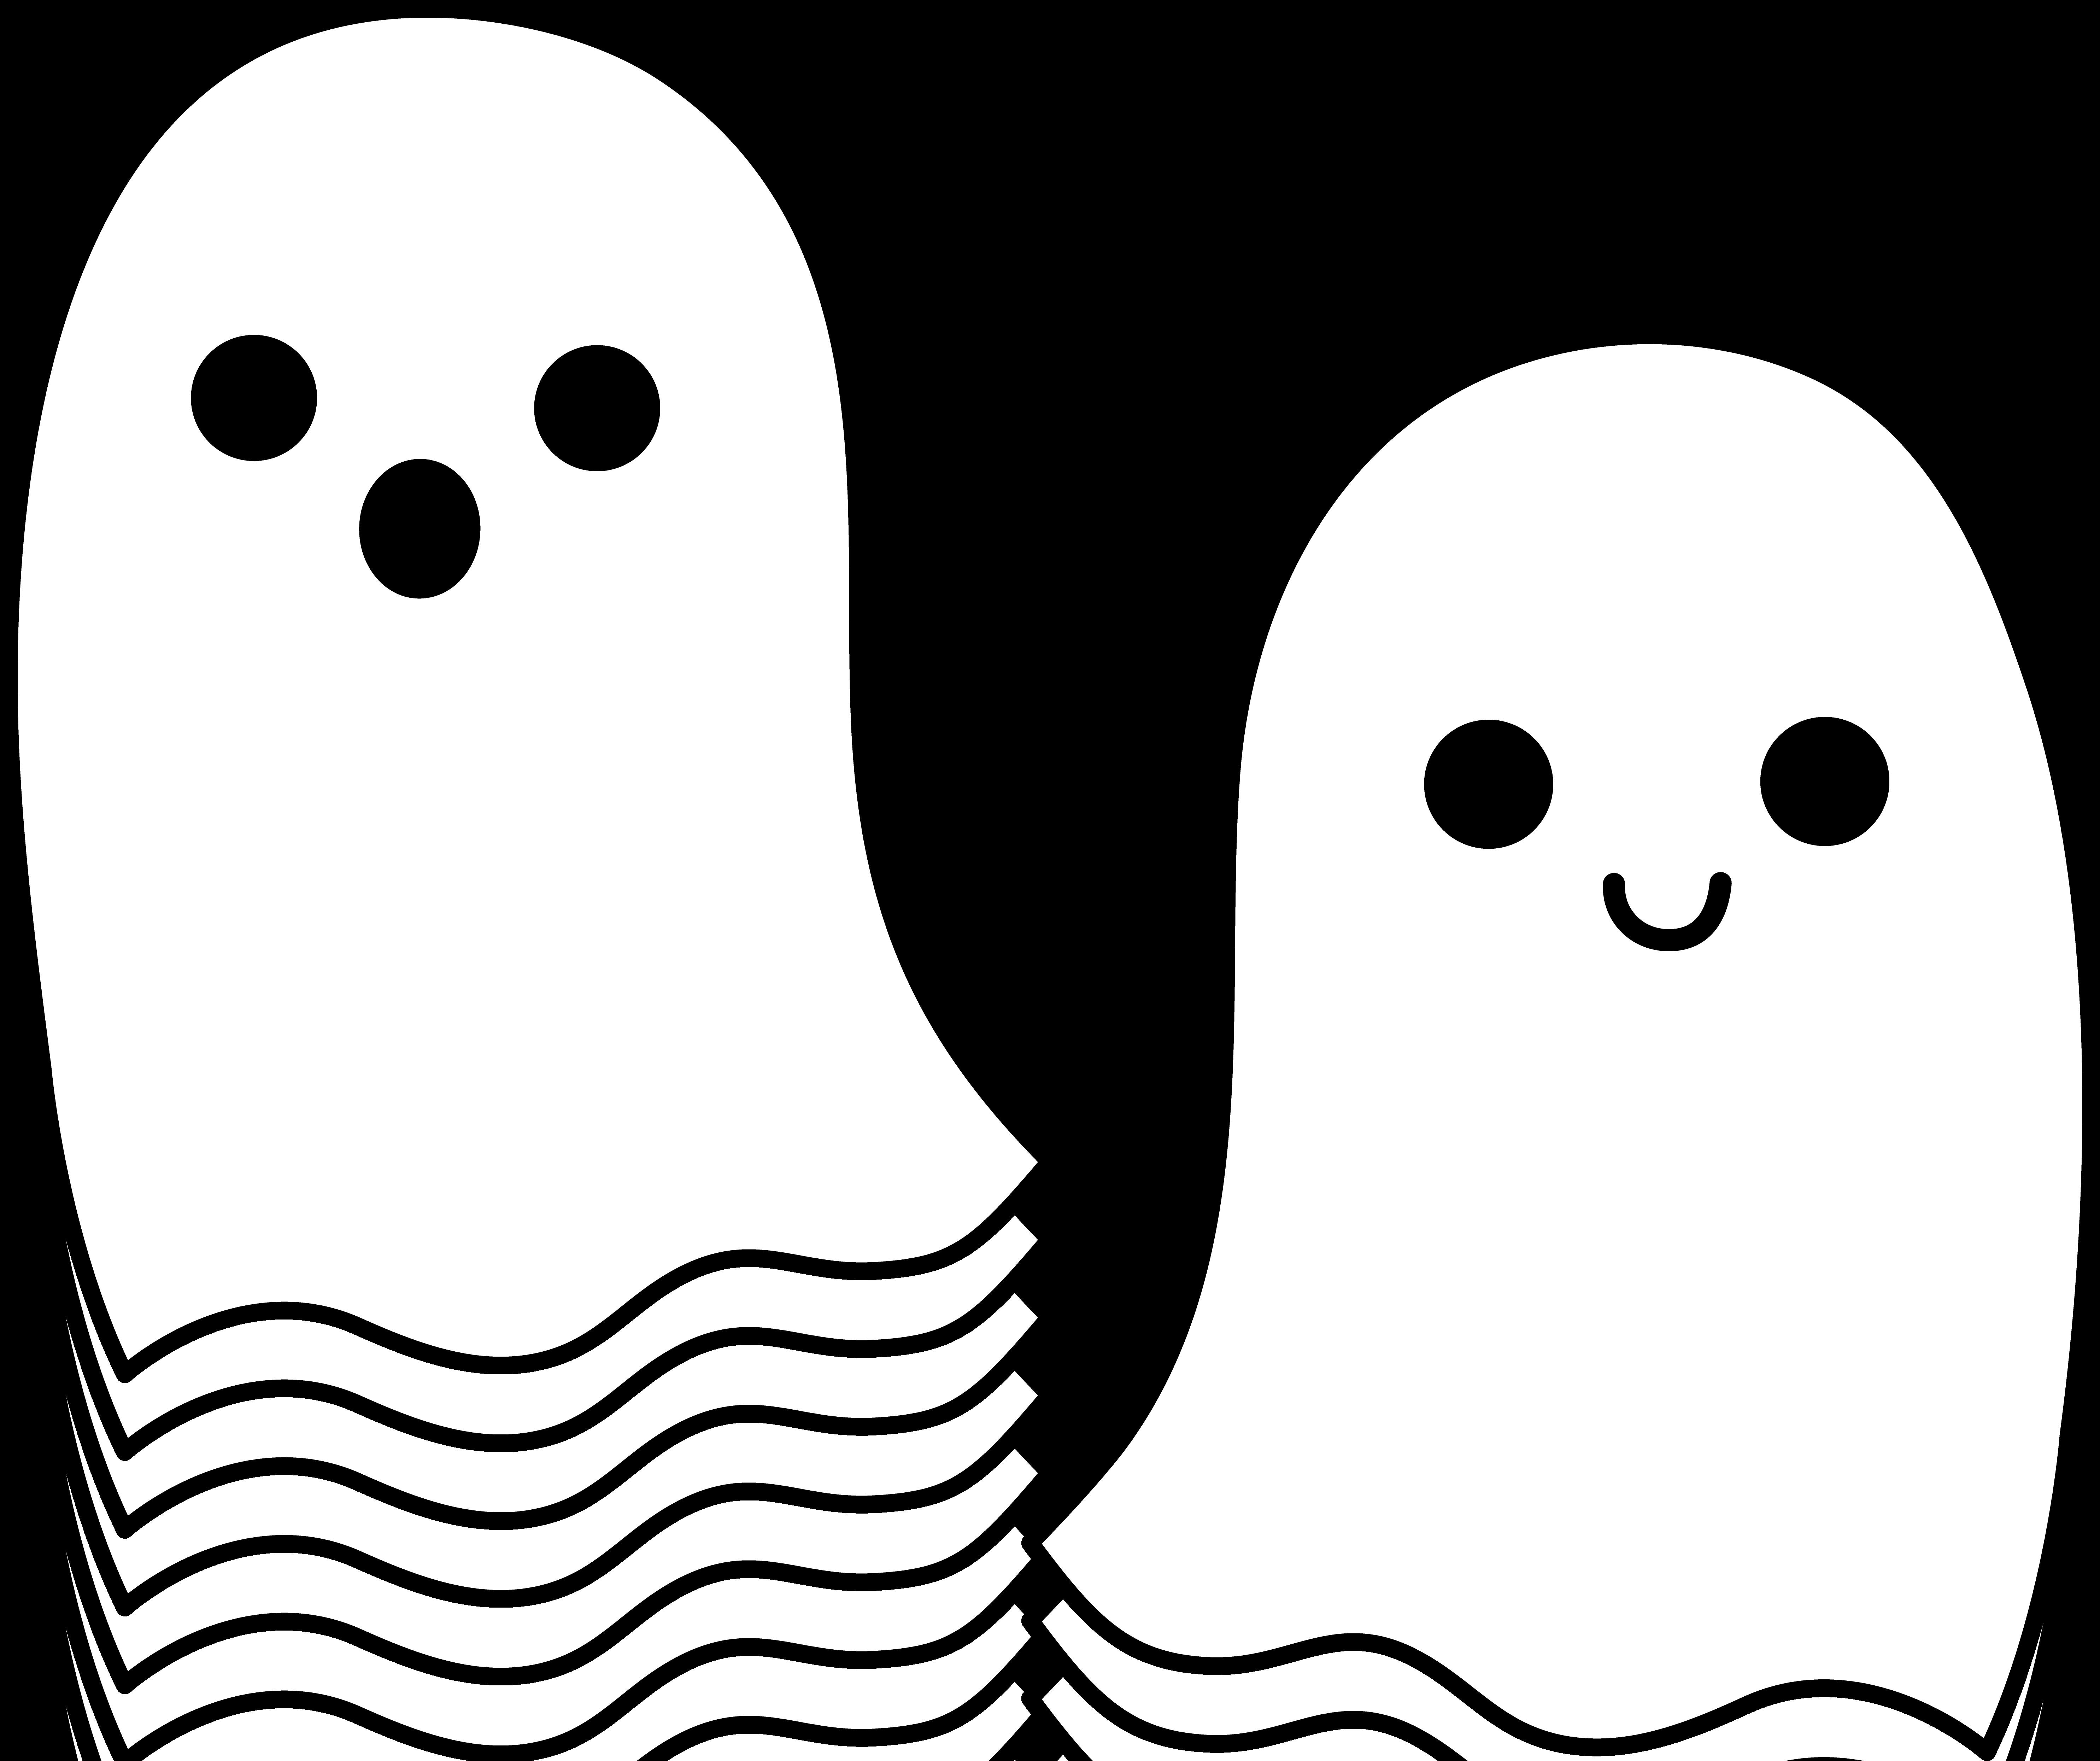 Cute Simple Halloween Ghosts - Free Clip Art